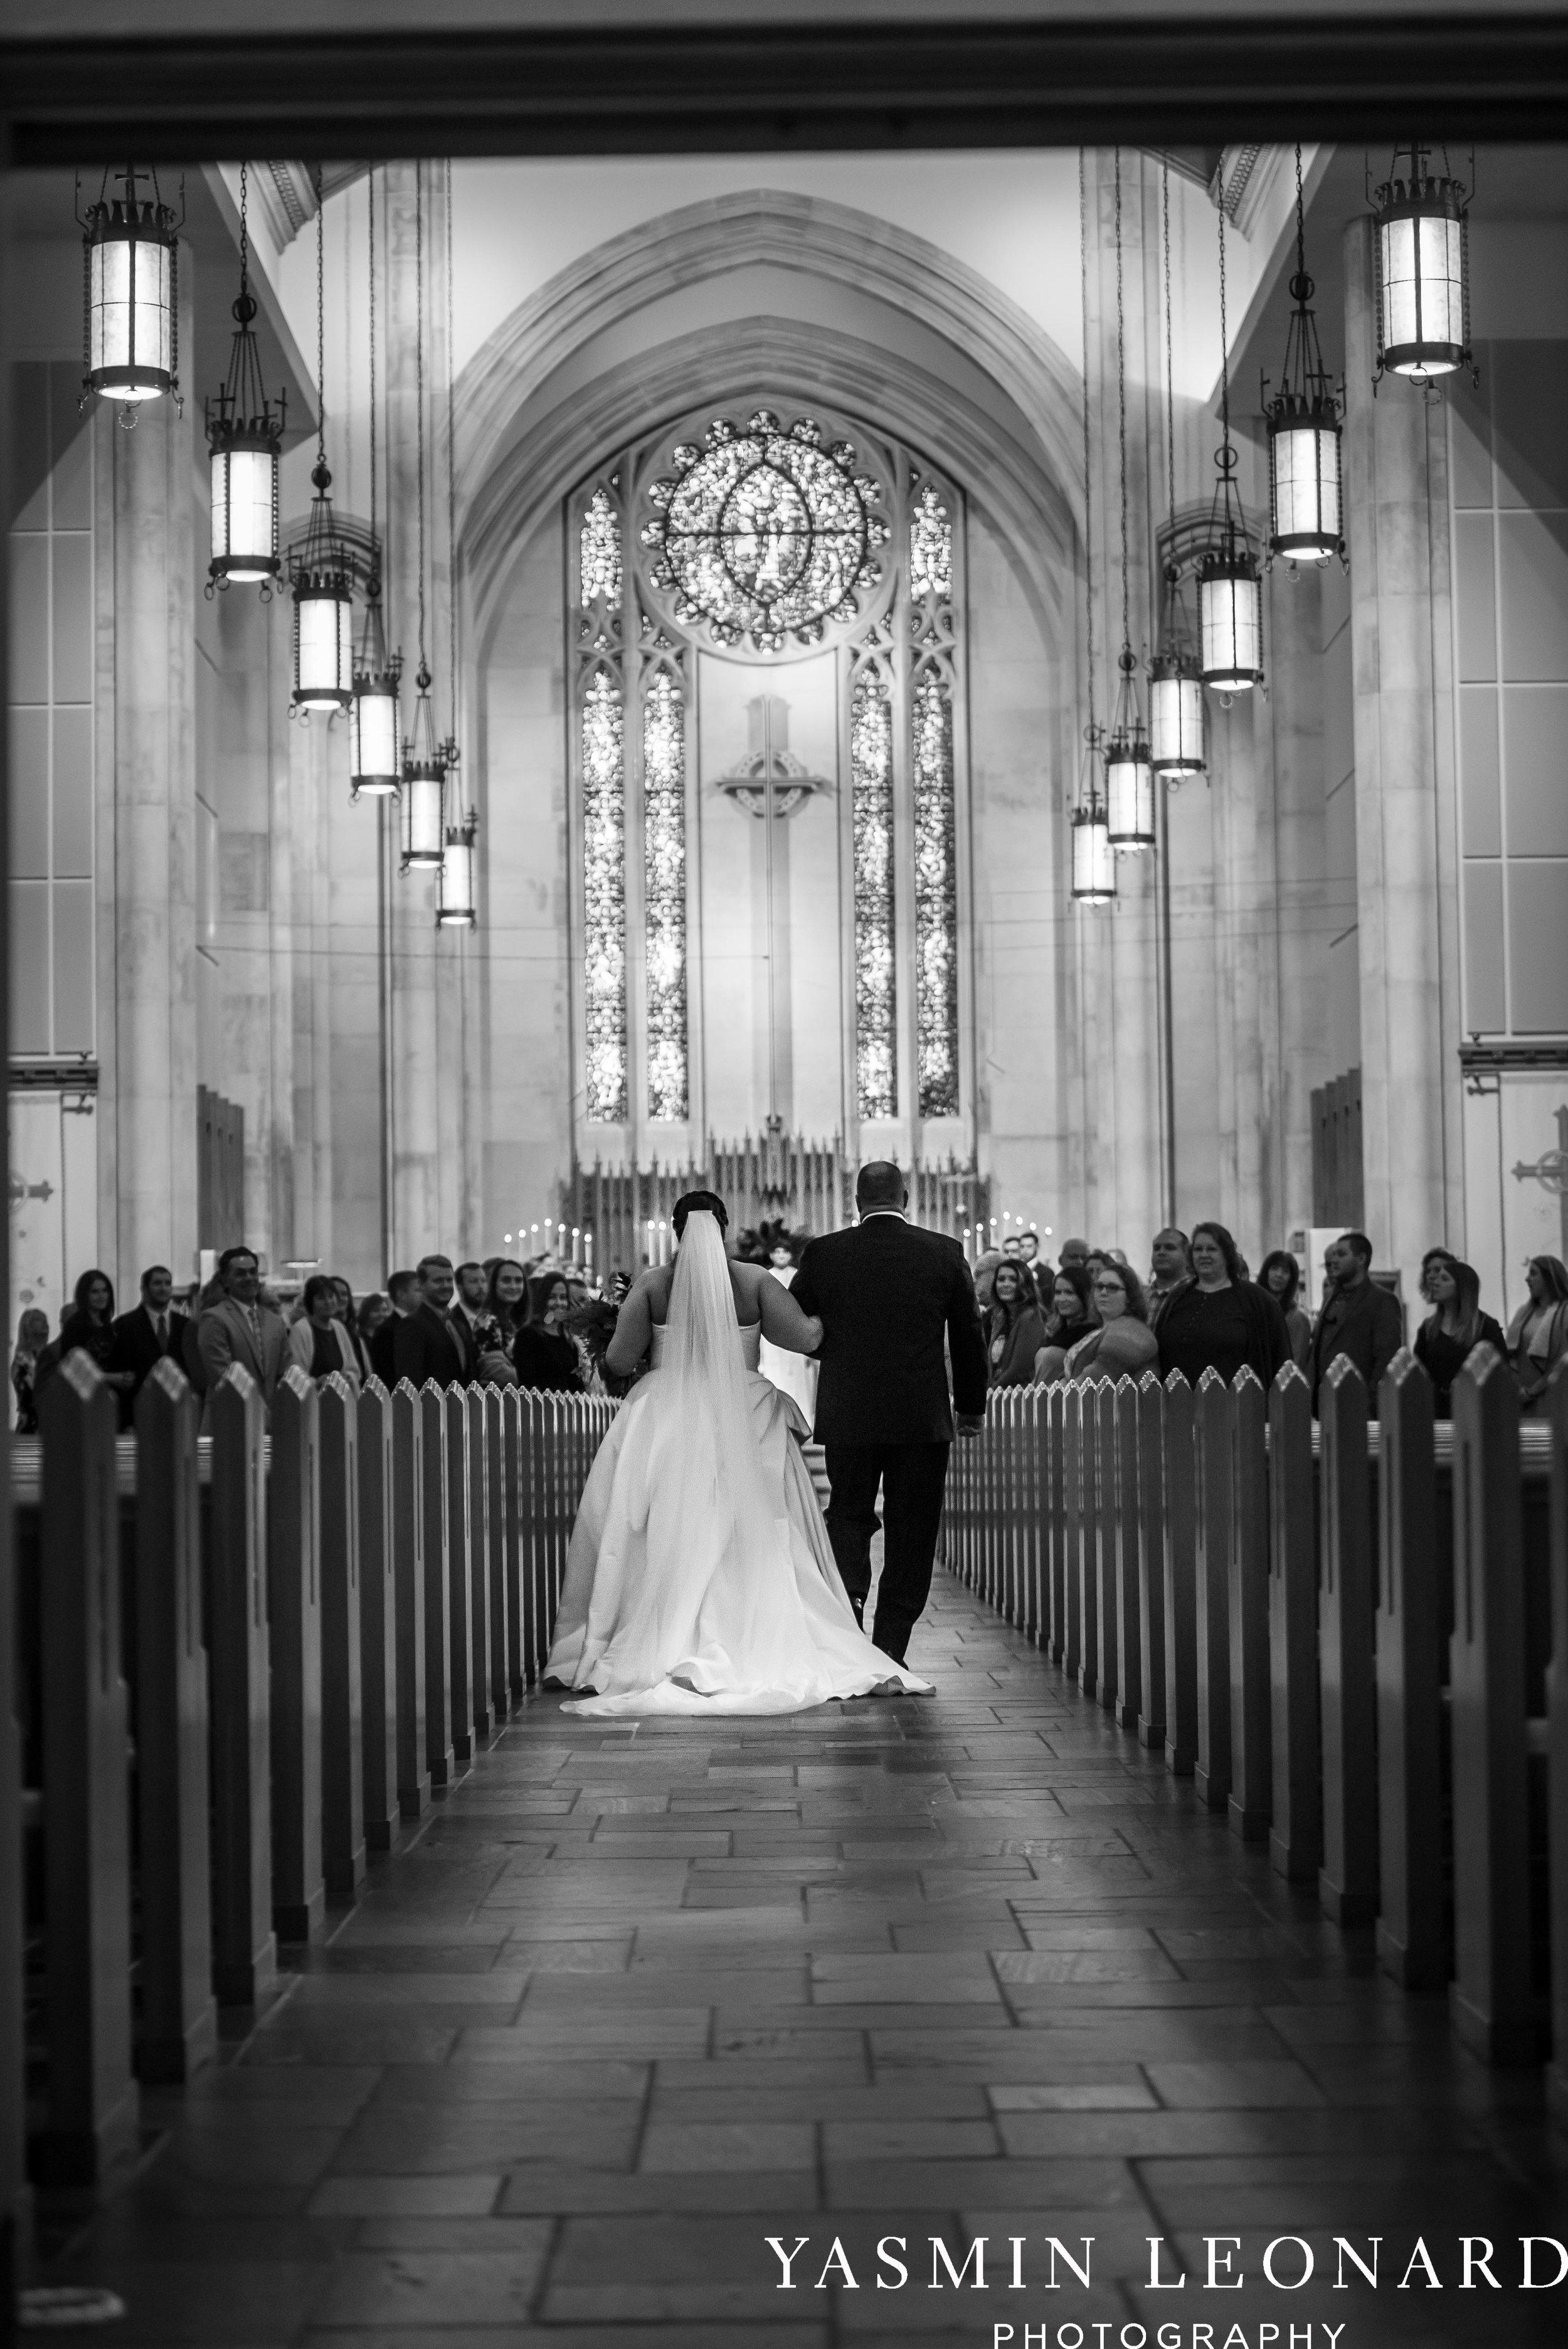 Wesley Memorial United Methodist Church - Old Homeplace Winery - High Point Weddings - High Point Wedding Photographer - NC Weddings - NC Barn Venue - Yasmin Leonard Photography-14.jpg